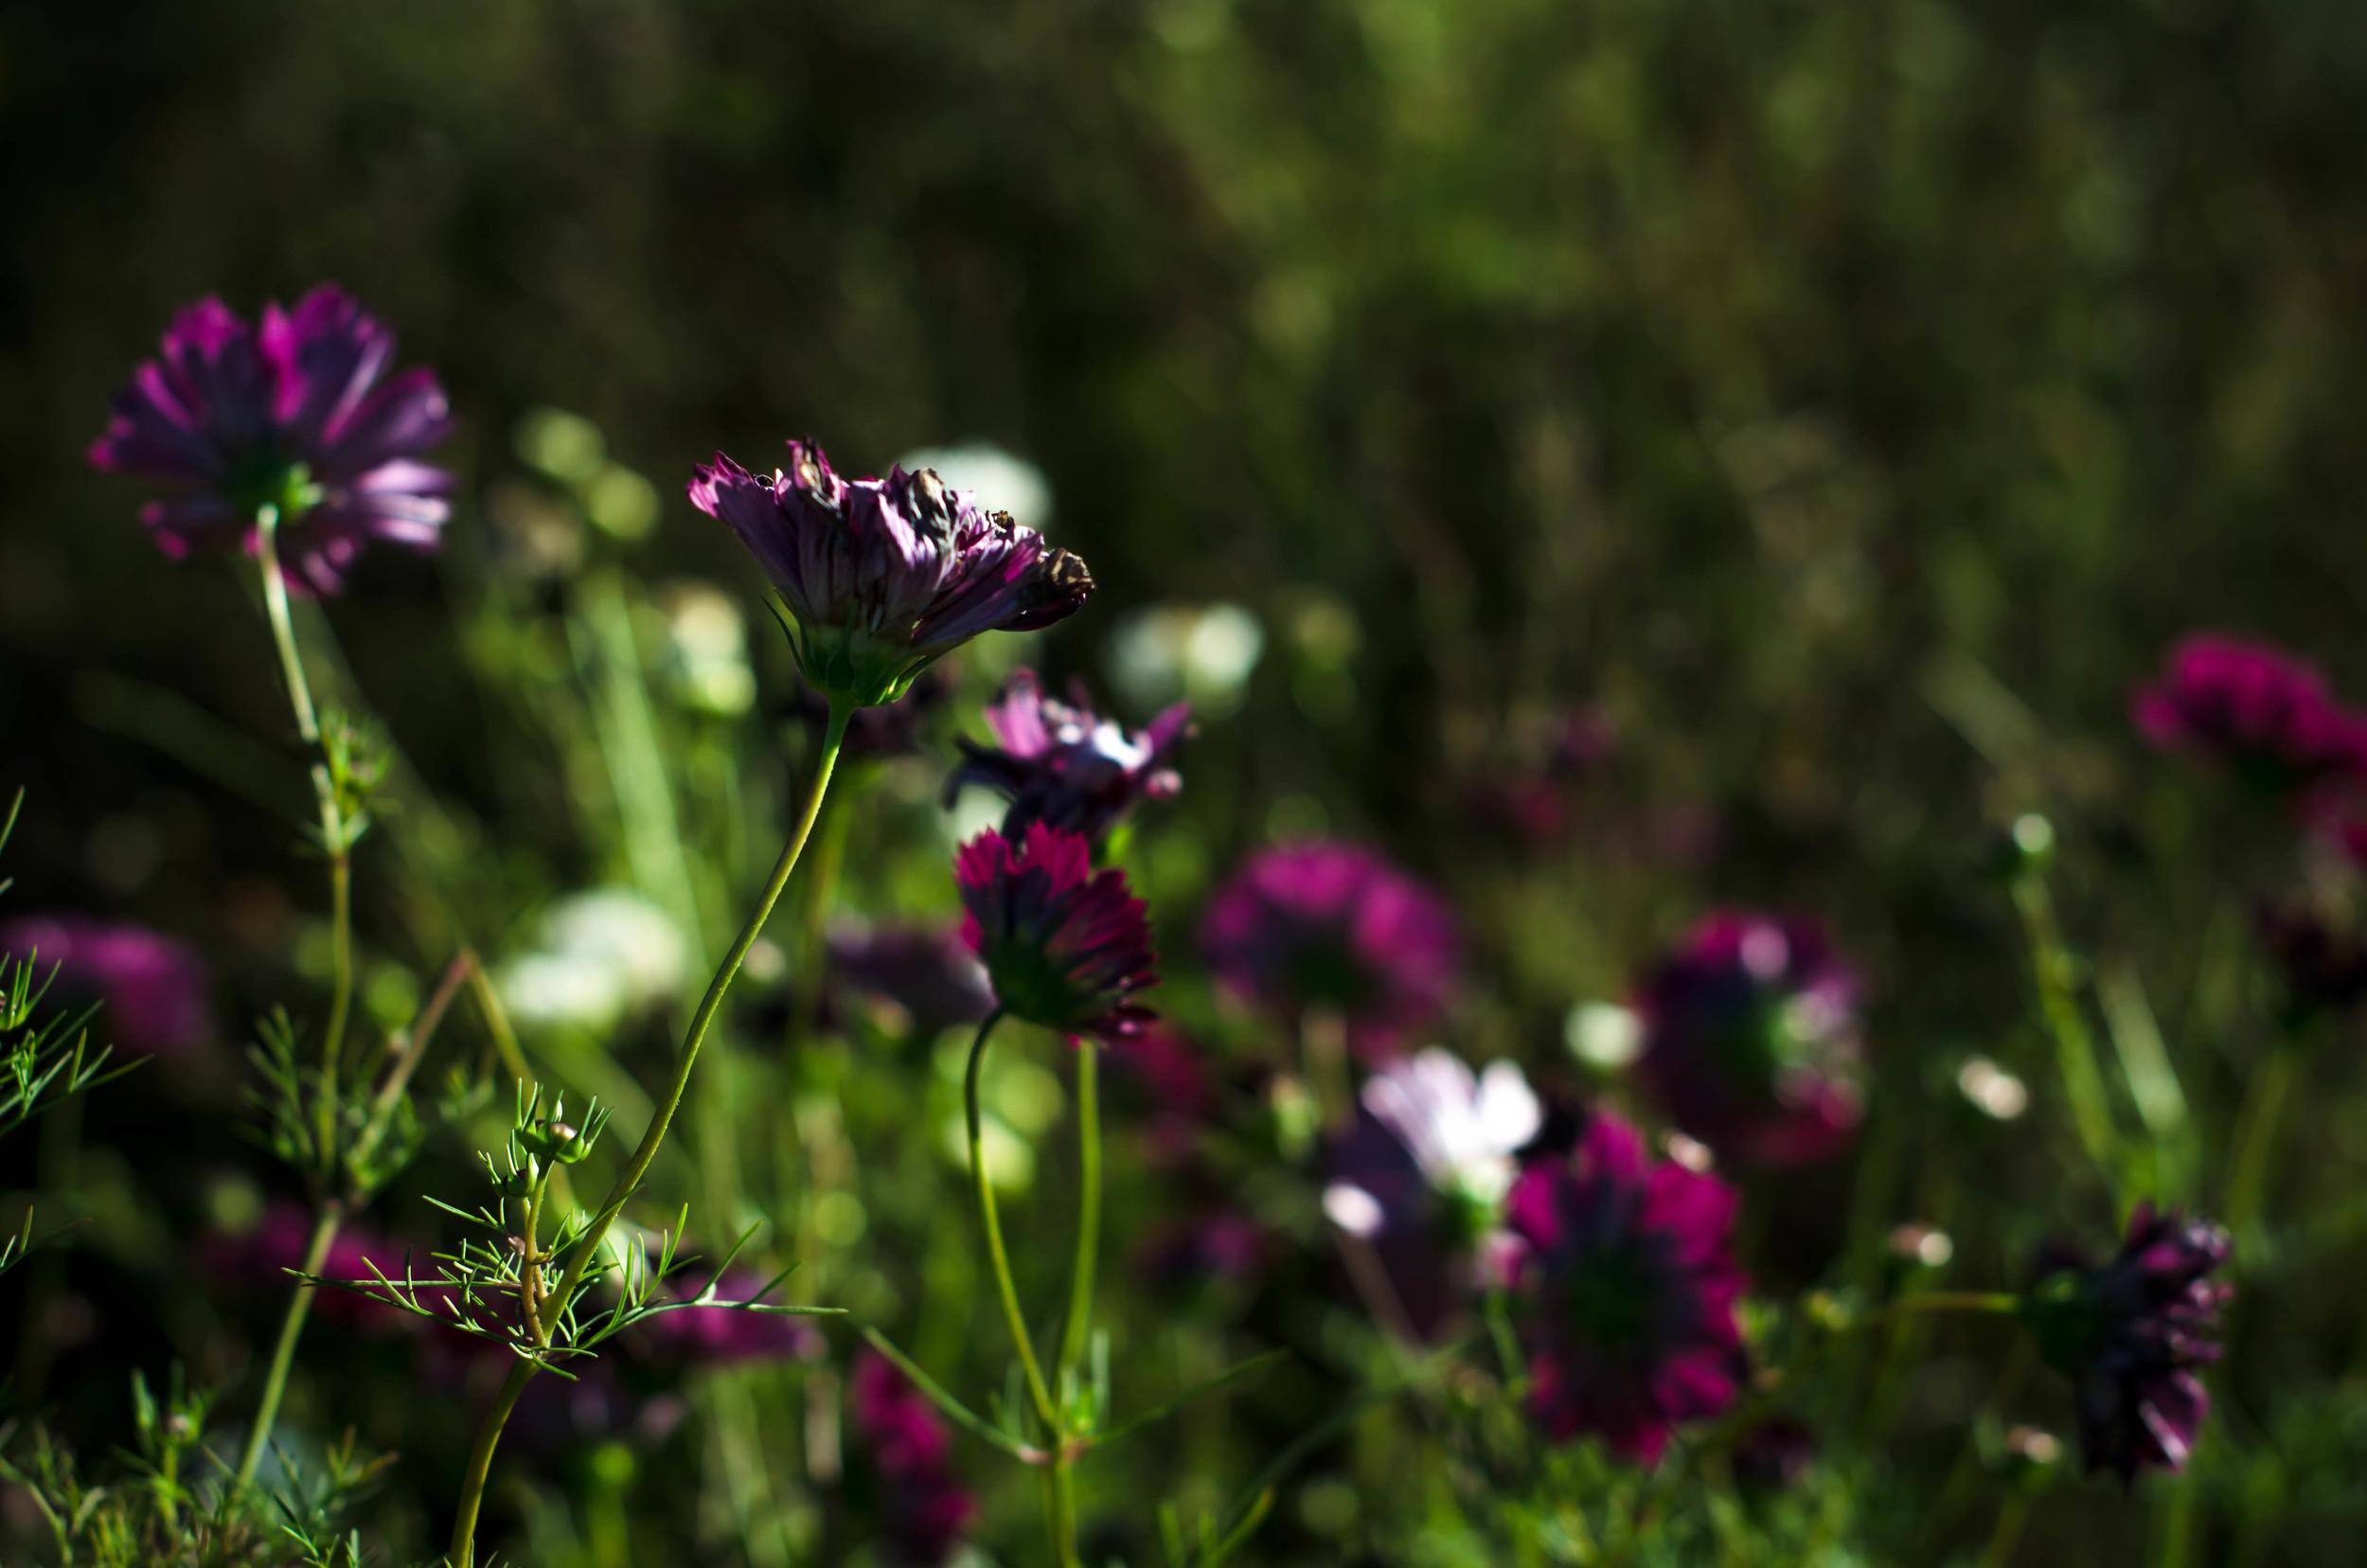 ROSE & IVY Journal Fields of Flowers